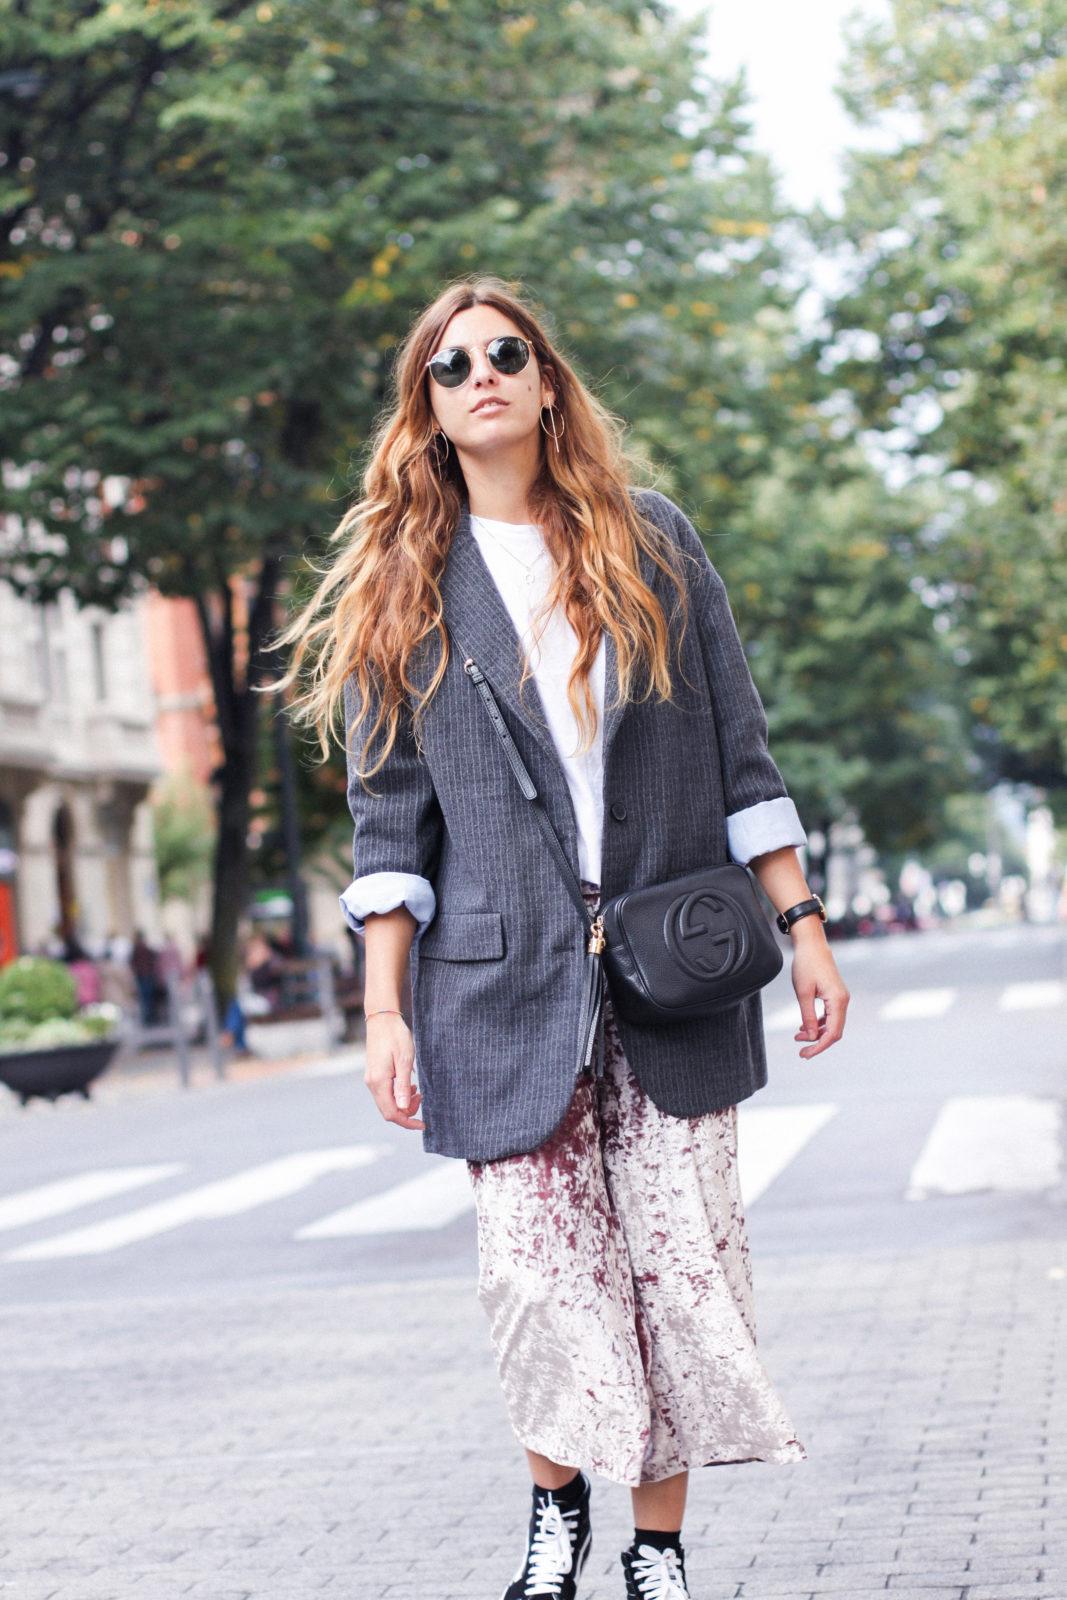 pantalones_terciopelo_rosa_pull_and_bear_blazer_vans_pendientes_aros_gucci-7